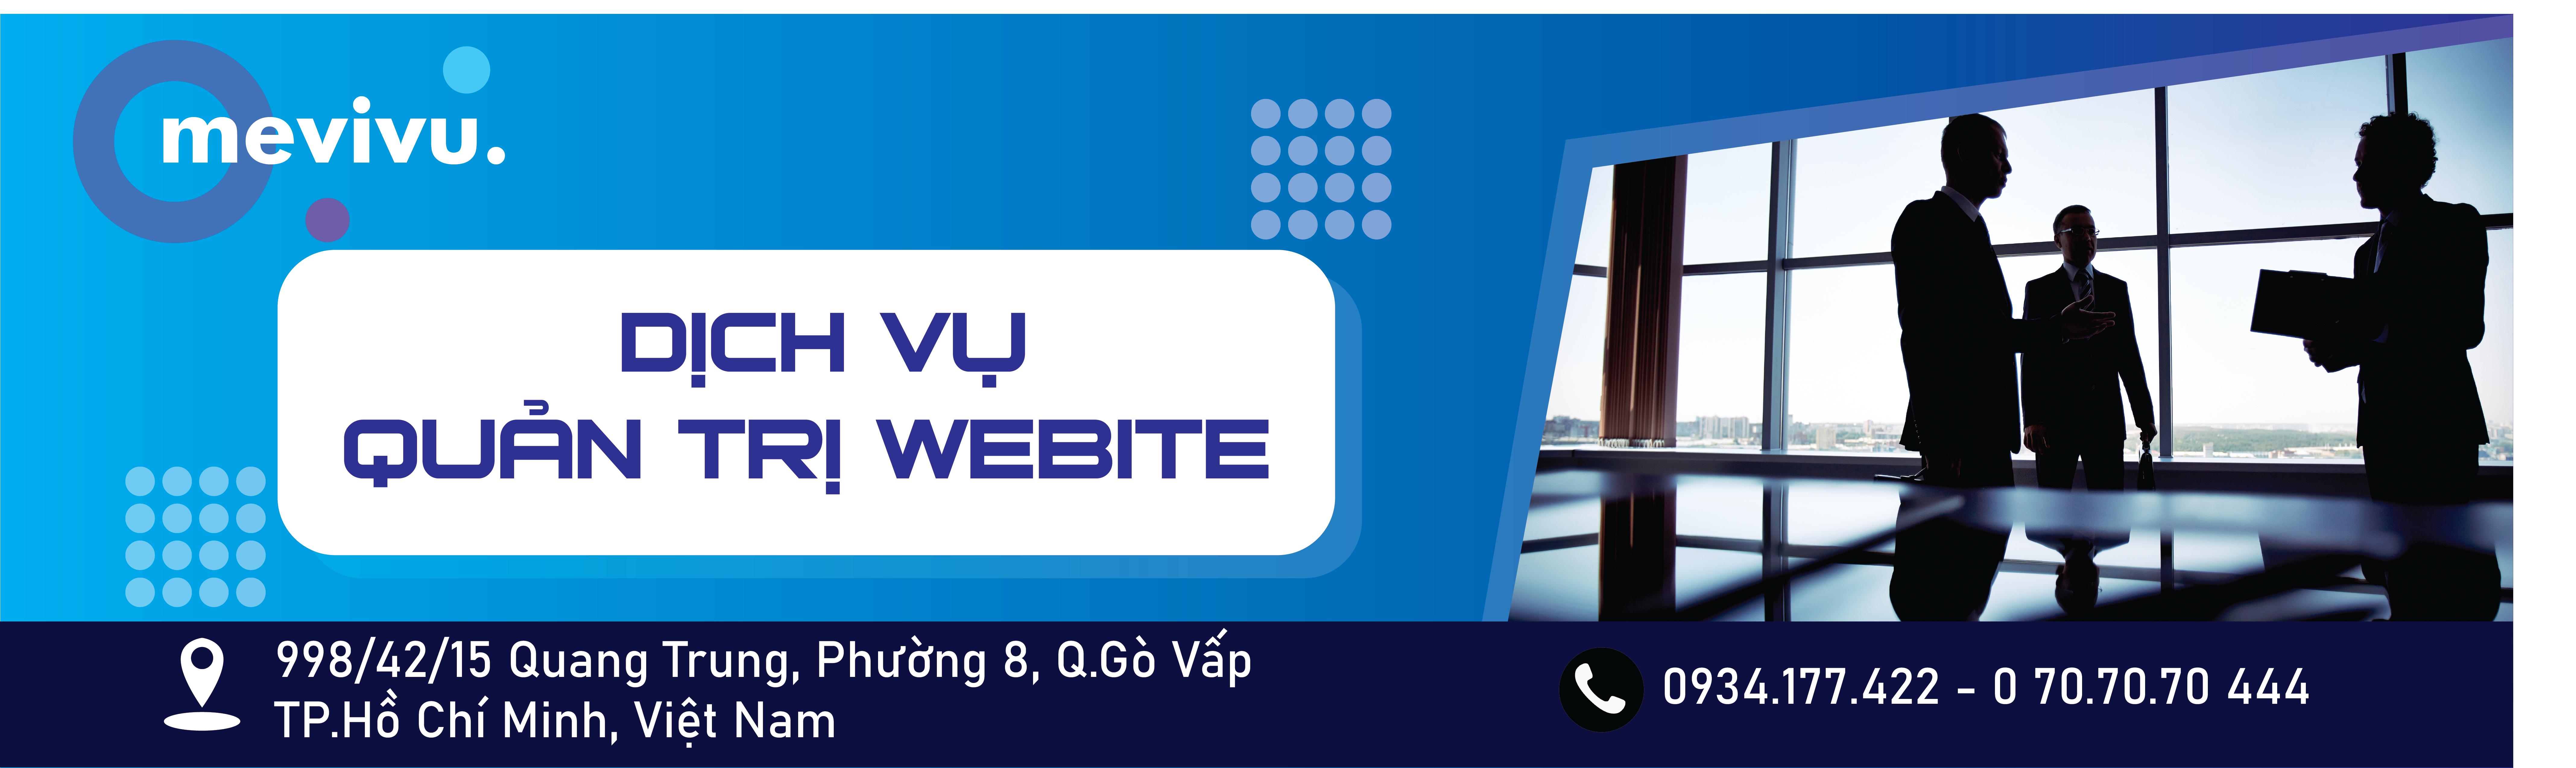 banner dịch vụ quản trị website